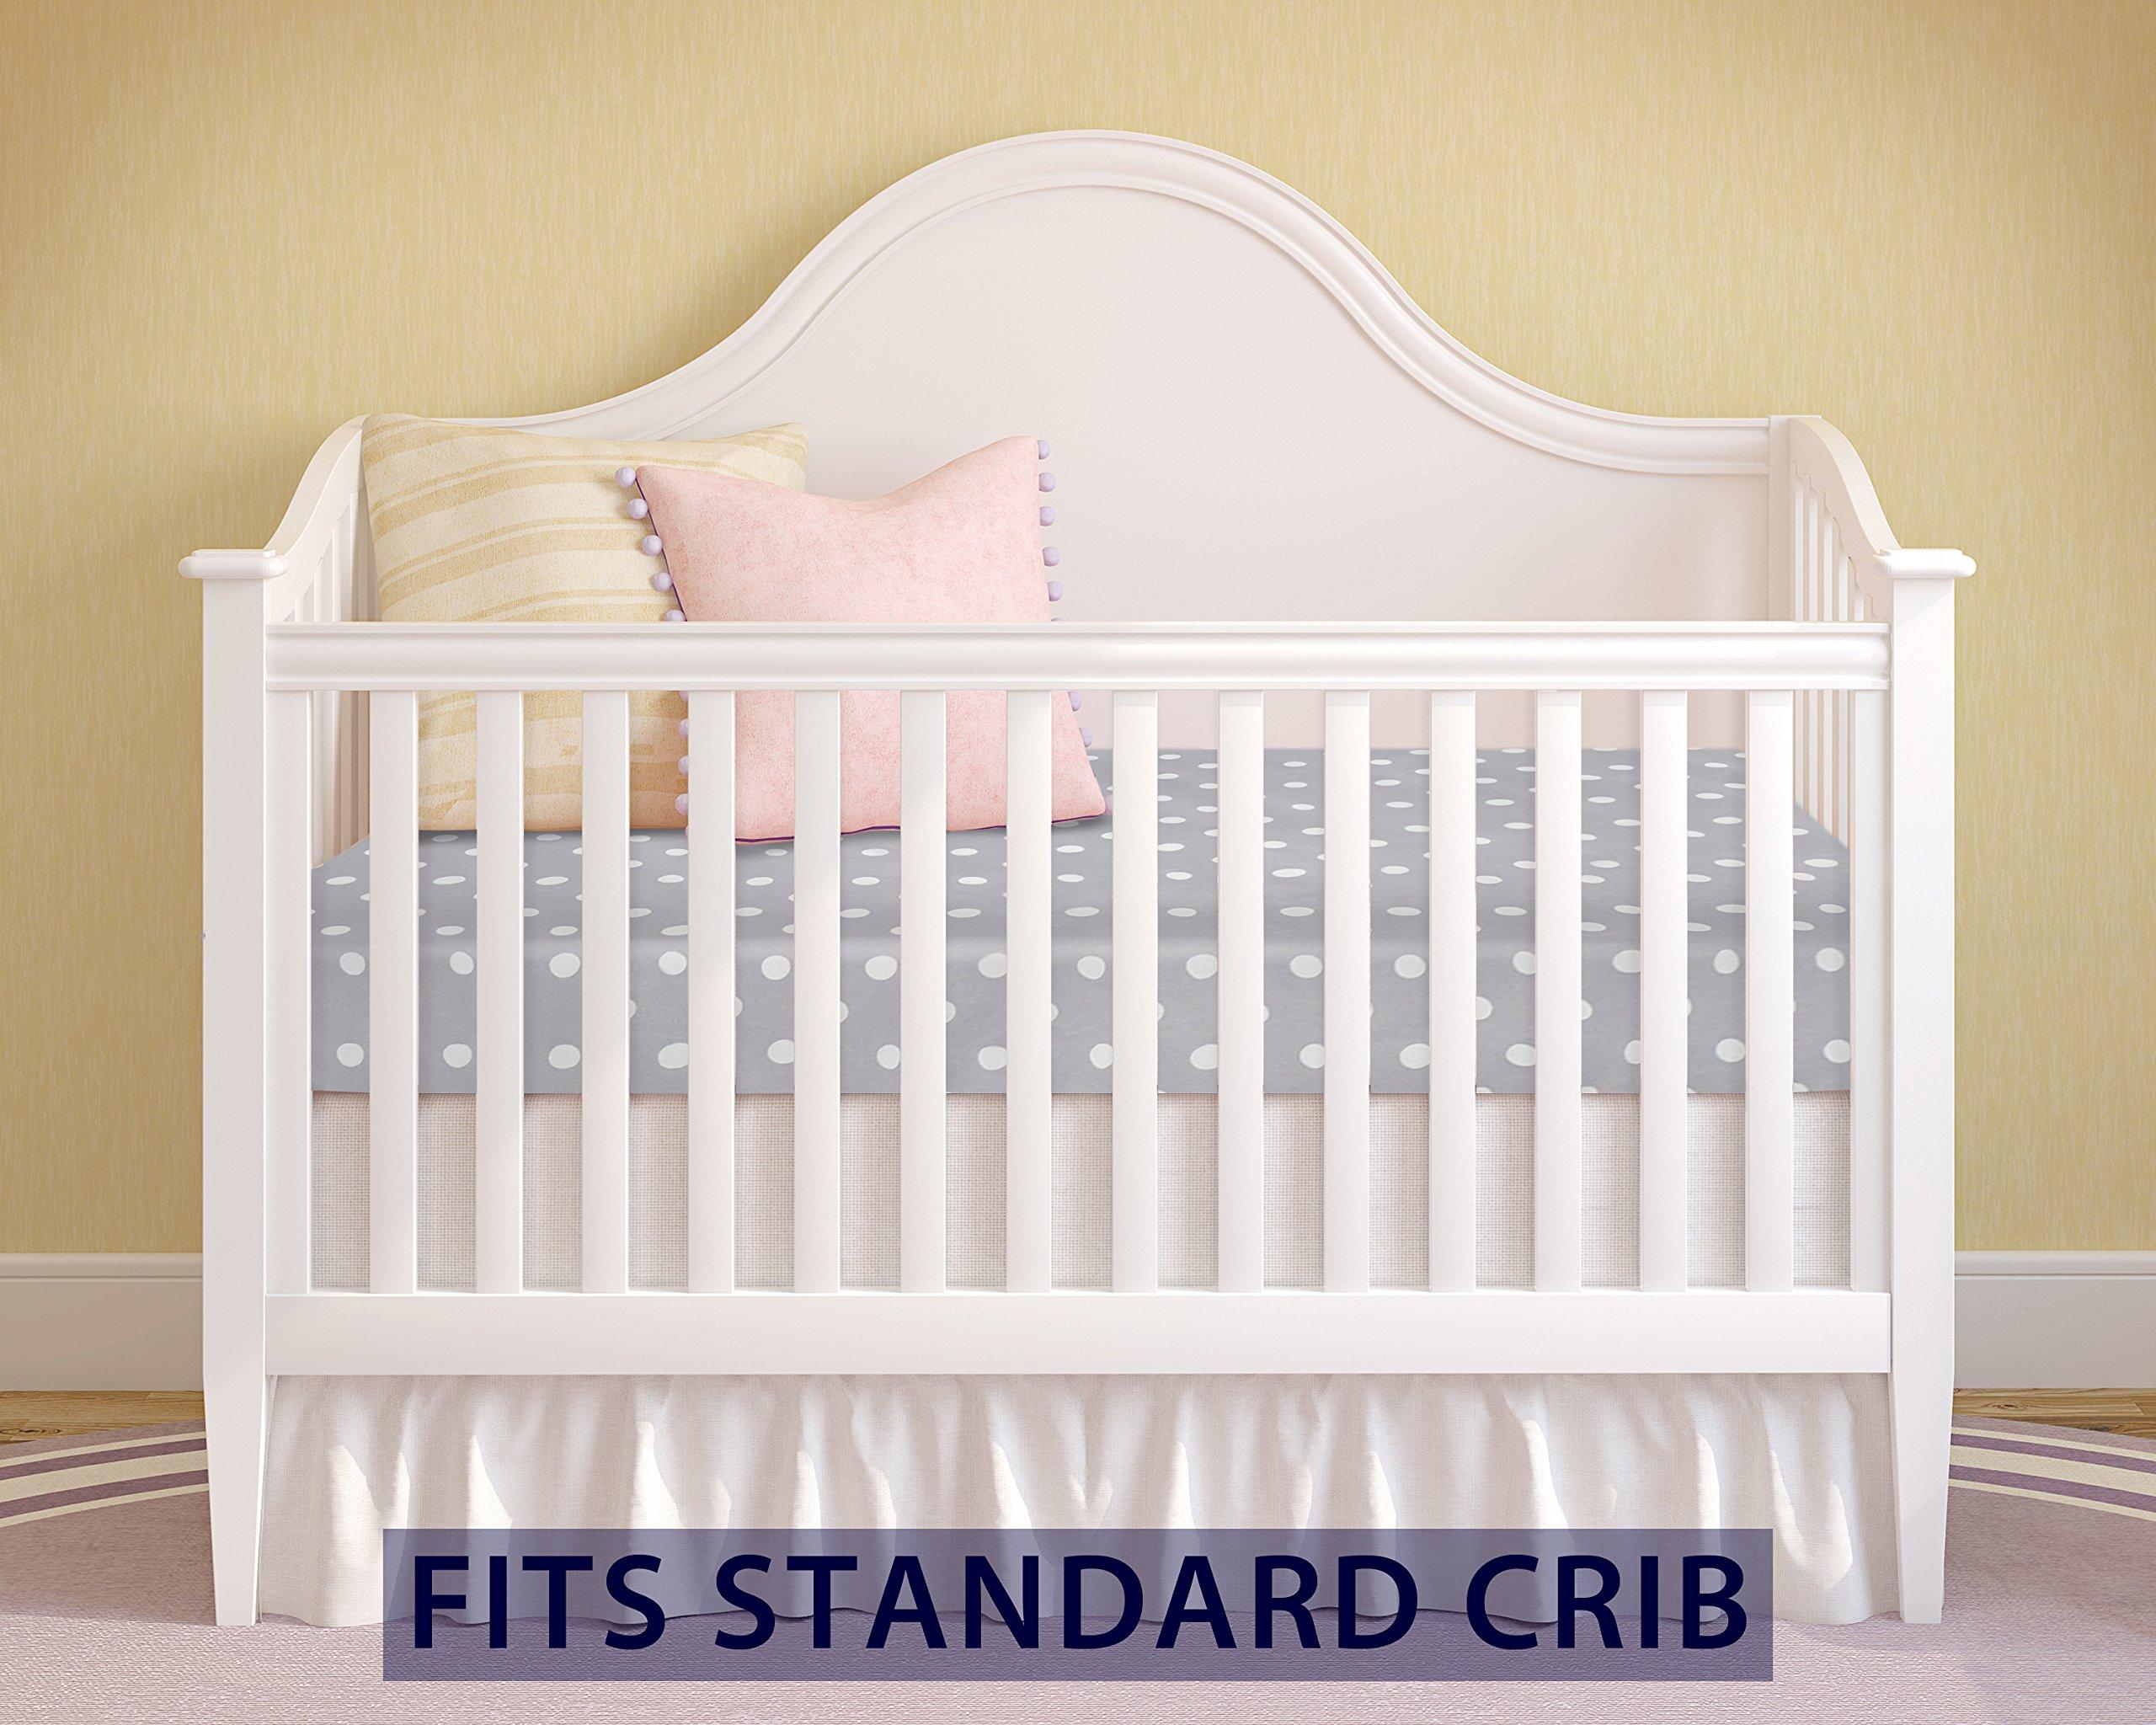 Milliard Crib Mattress and Toddler Bed Mattress | Hypoallergenic + Waterproof Encasement | 27.5''x52''x5'' by Milliard (Image #5)